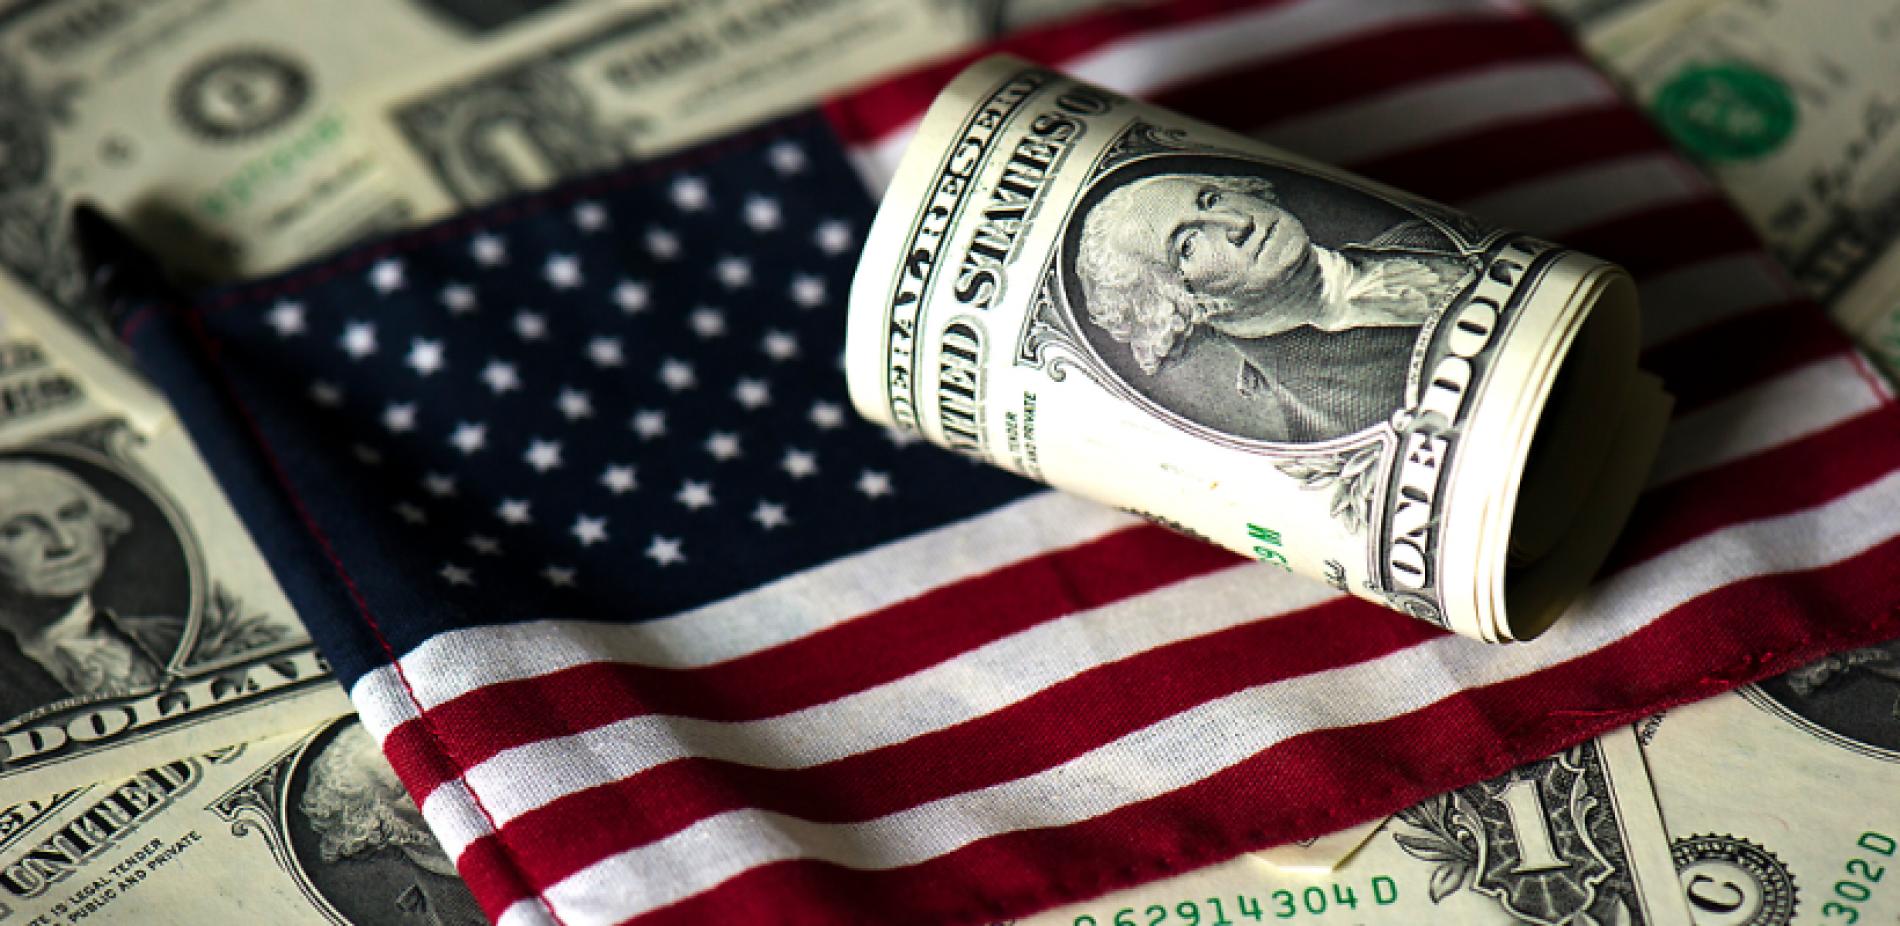 Sirijska kriza oslabila dolar, funta jača